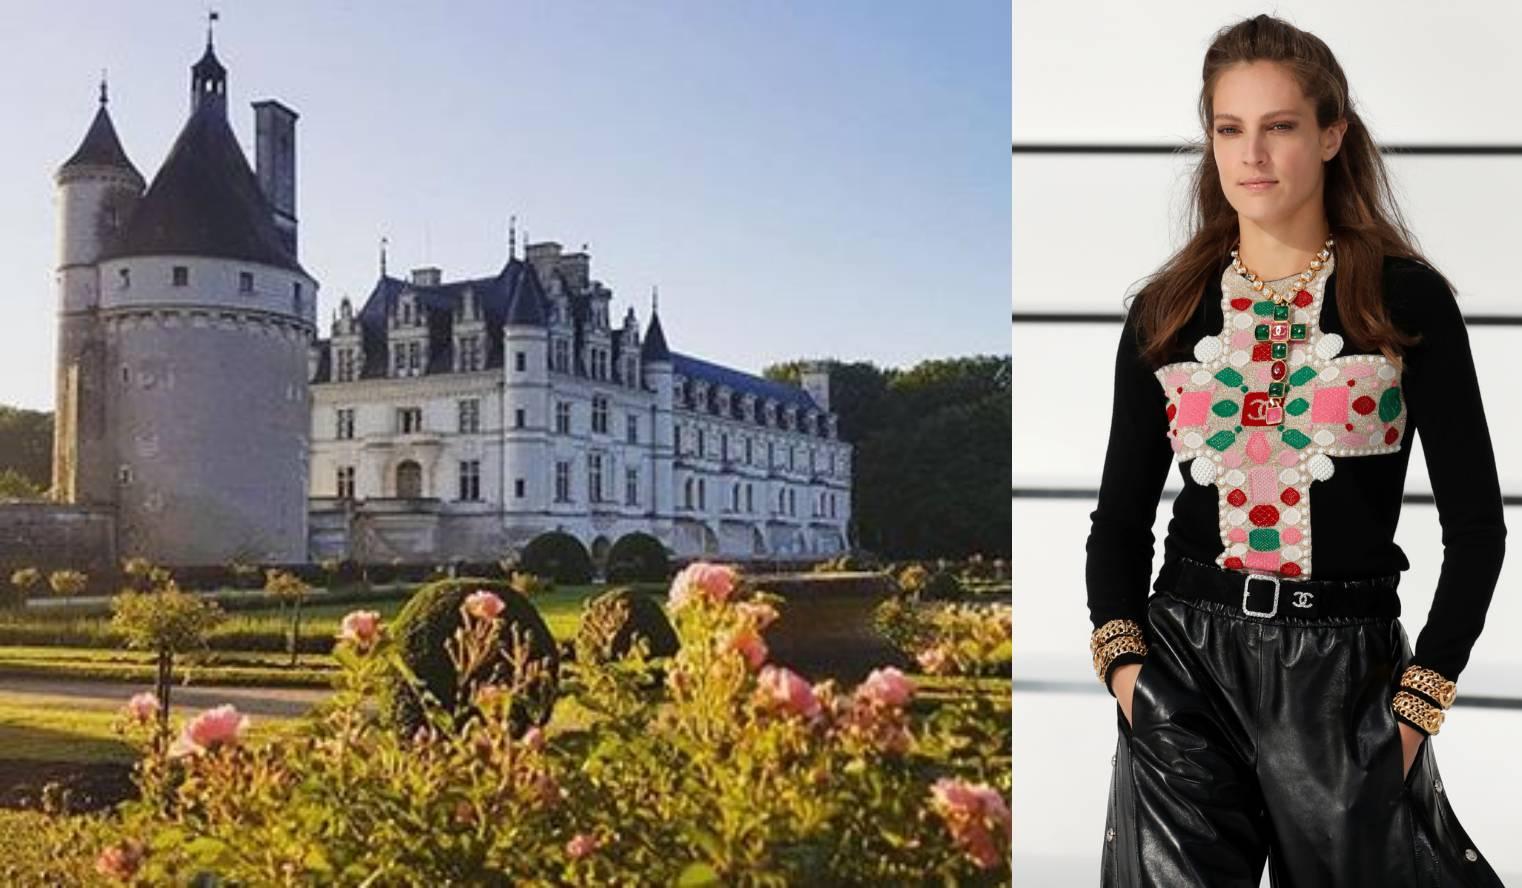 Chanel će svoju novu Métiers D'Art kolekciju predstaviti u veličanstvenom dvorcu